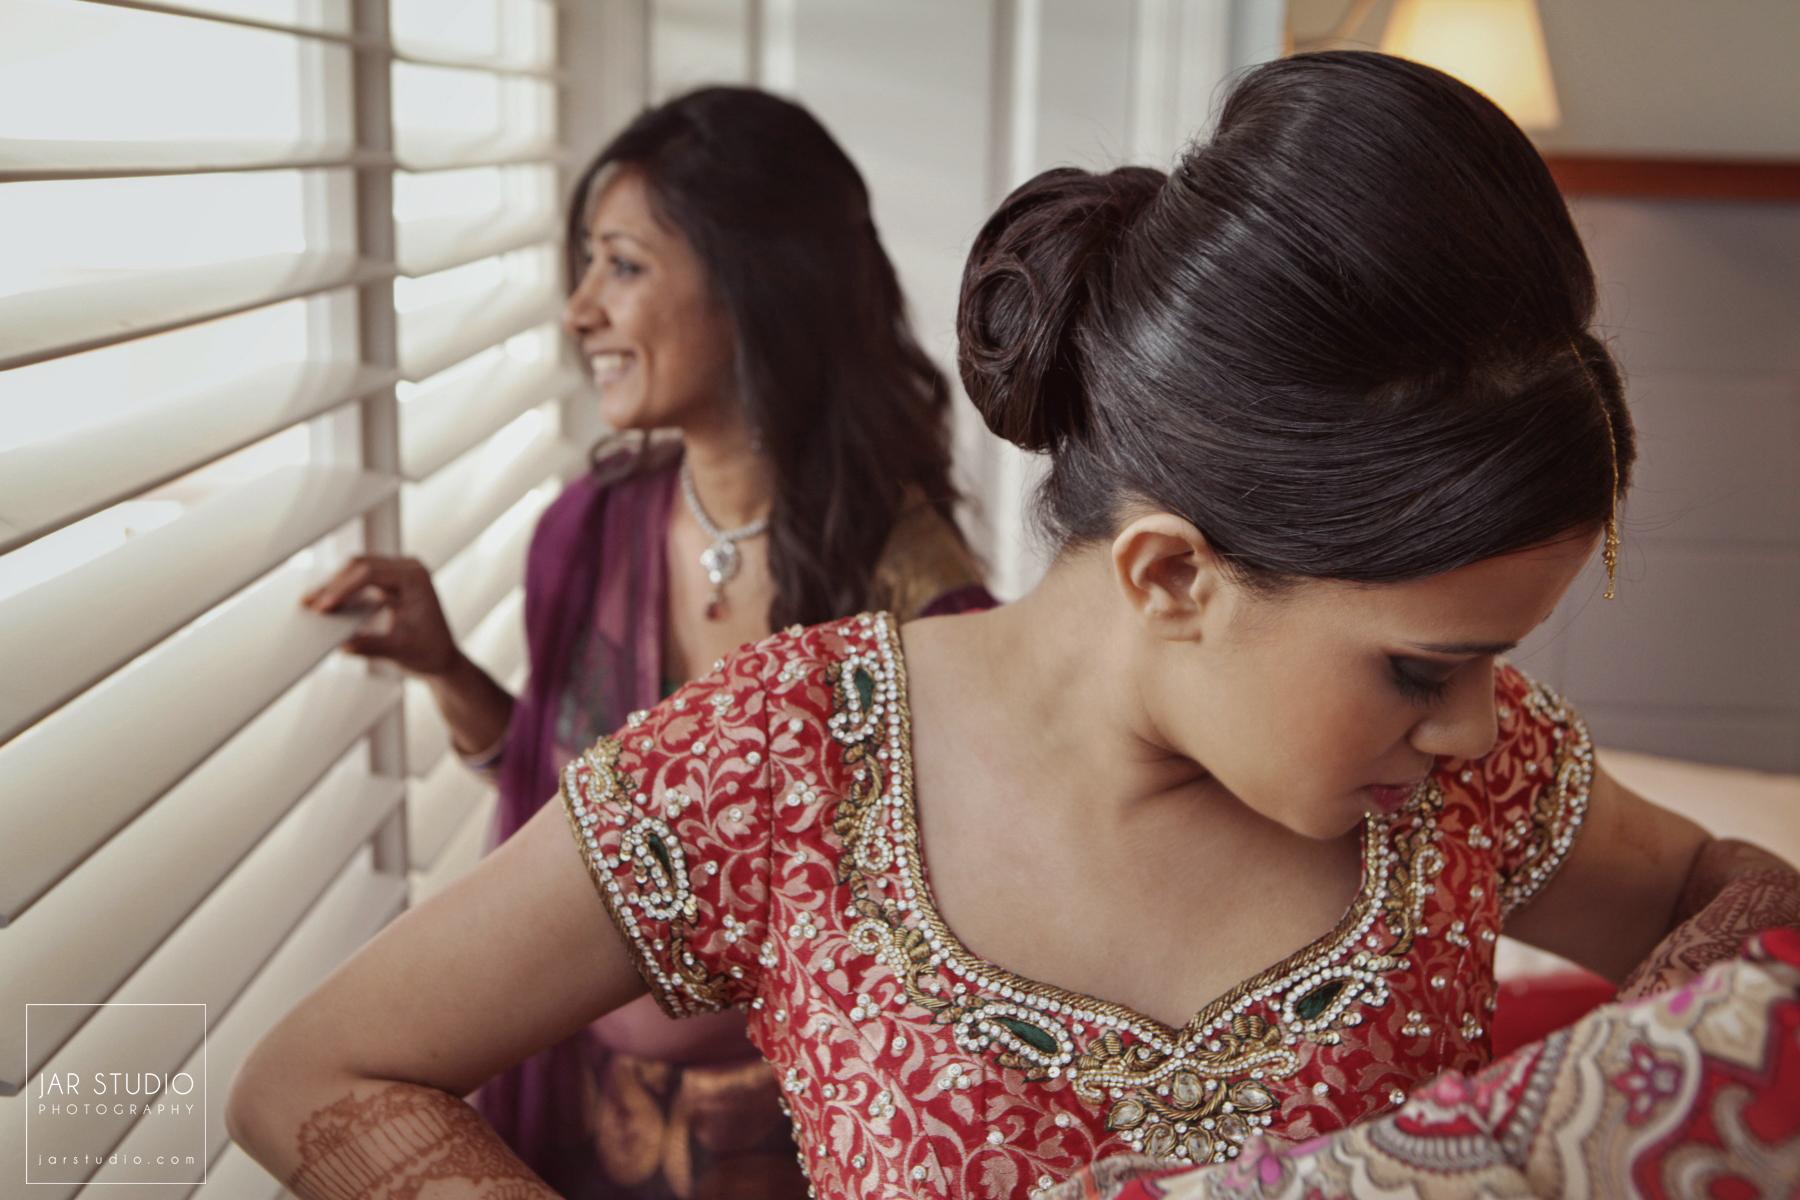 11-hindu-bride-getting-ready-jarstudio-photography.JPG